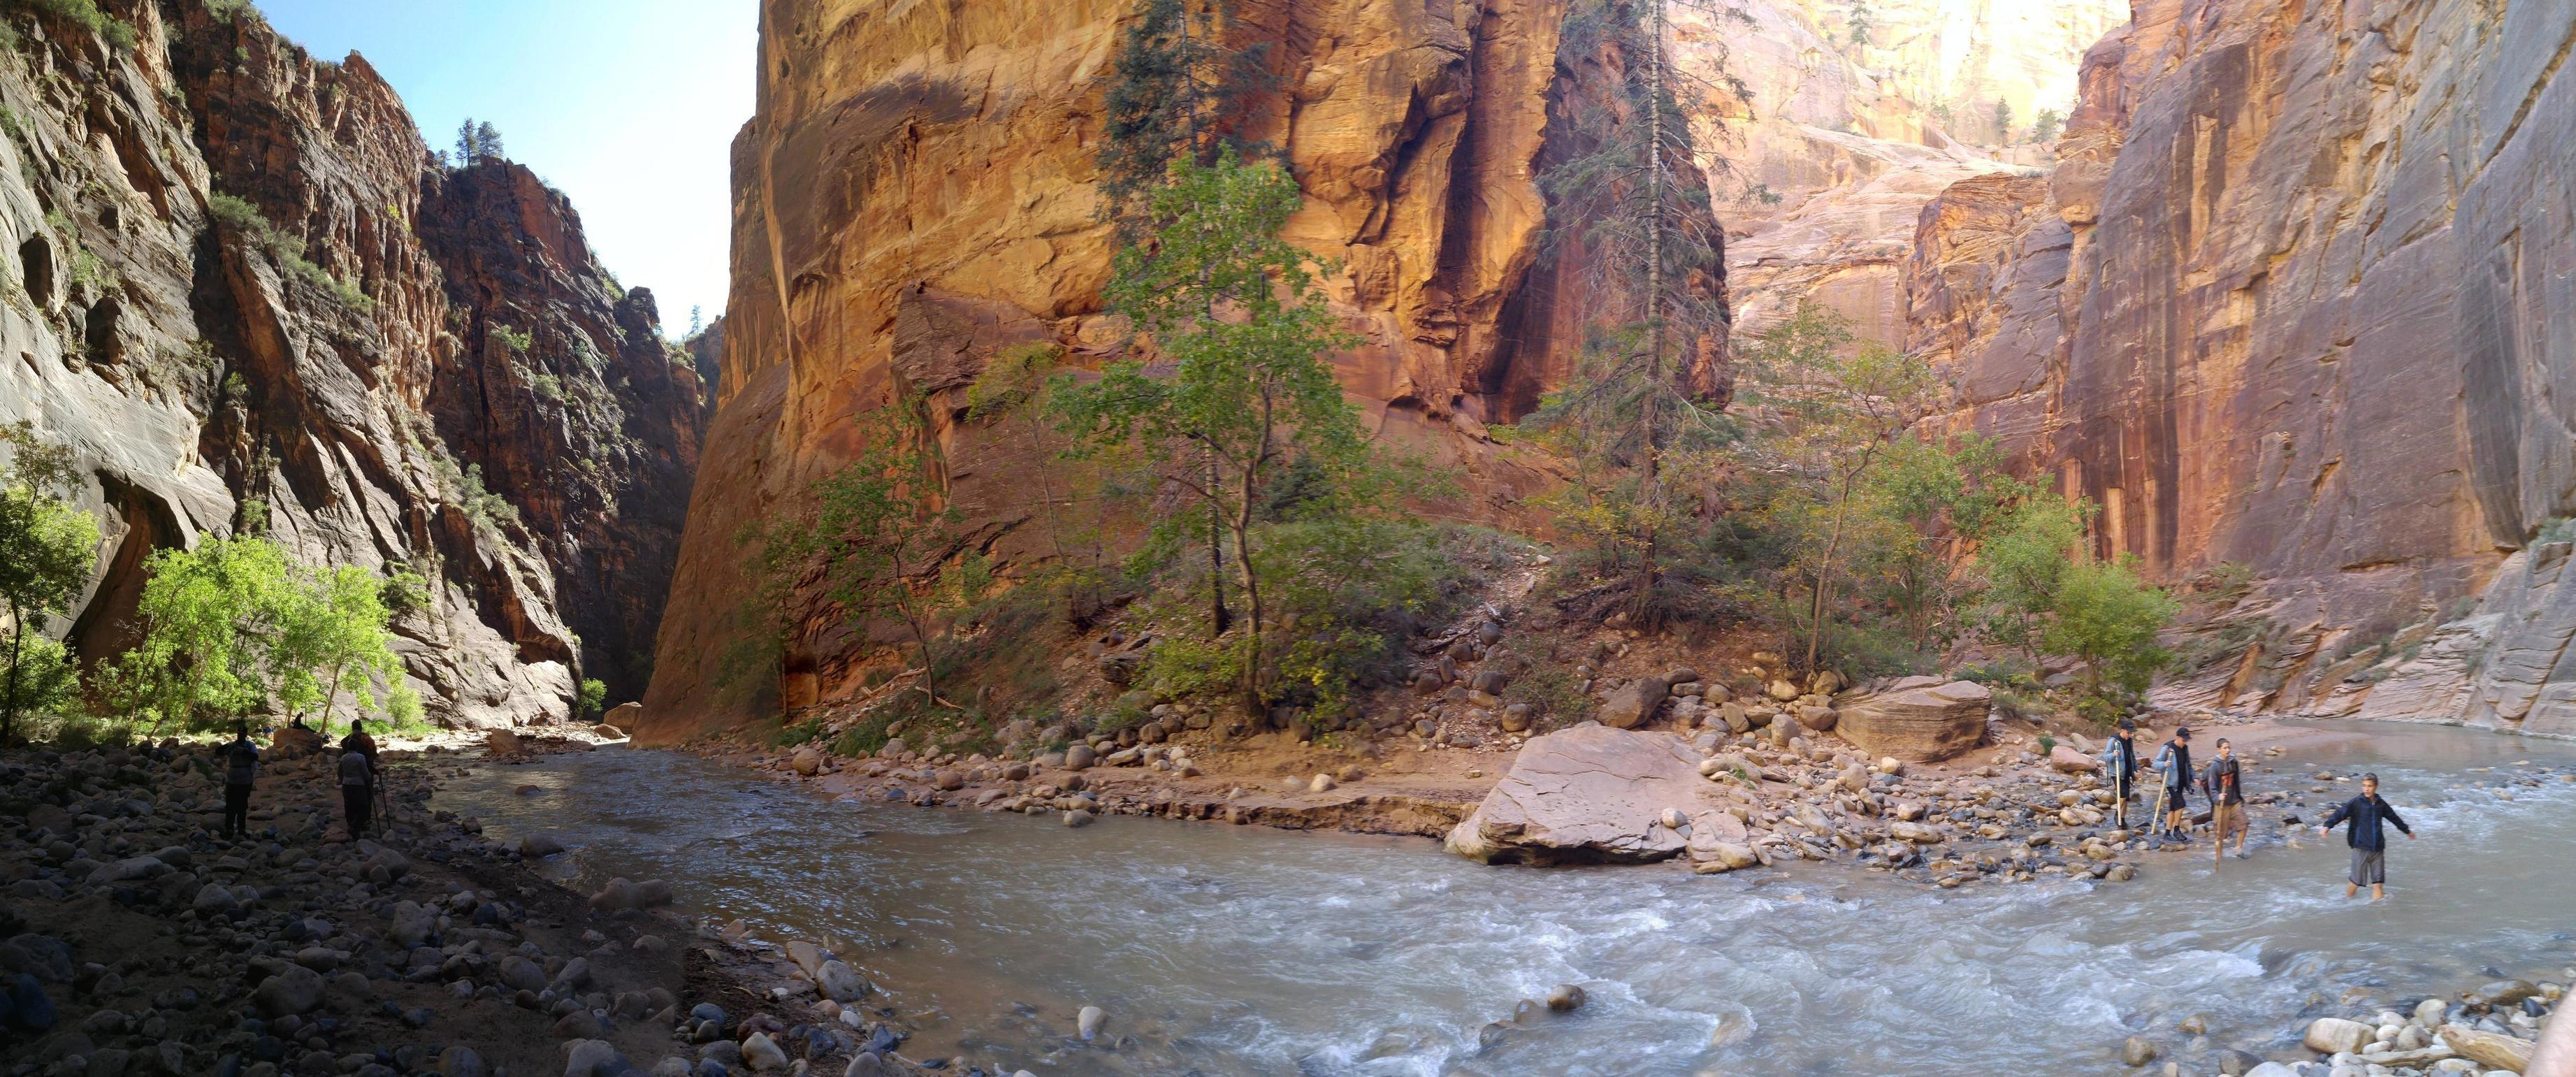 Hikied The Narrows At Zion National Park Hd Wallpaper